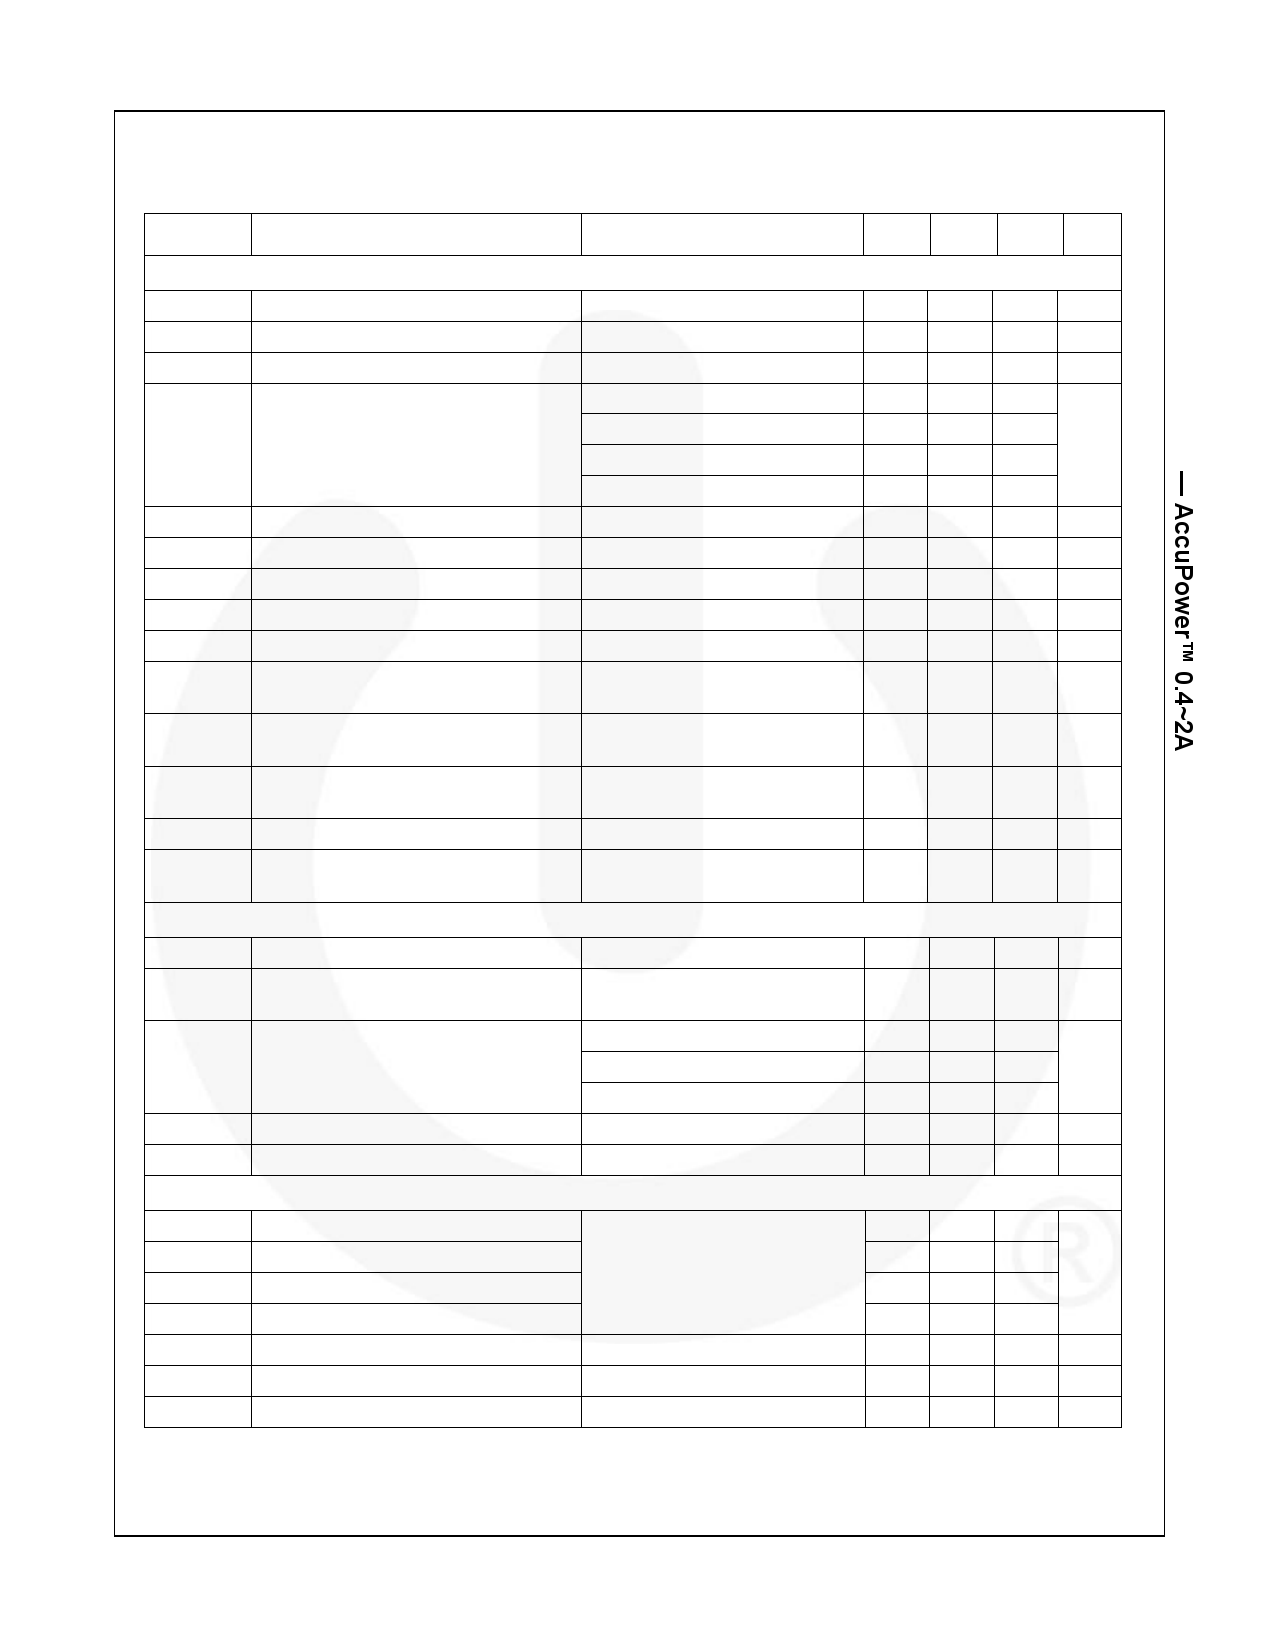 FPF2702 pdf, arduino